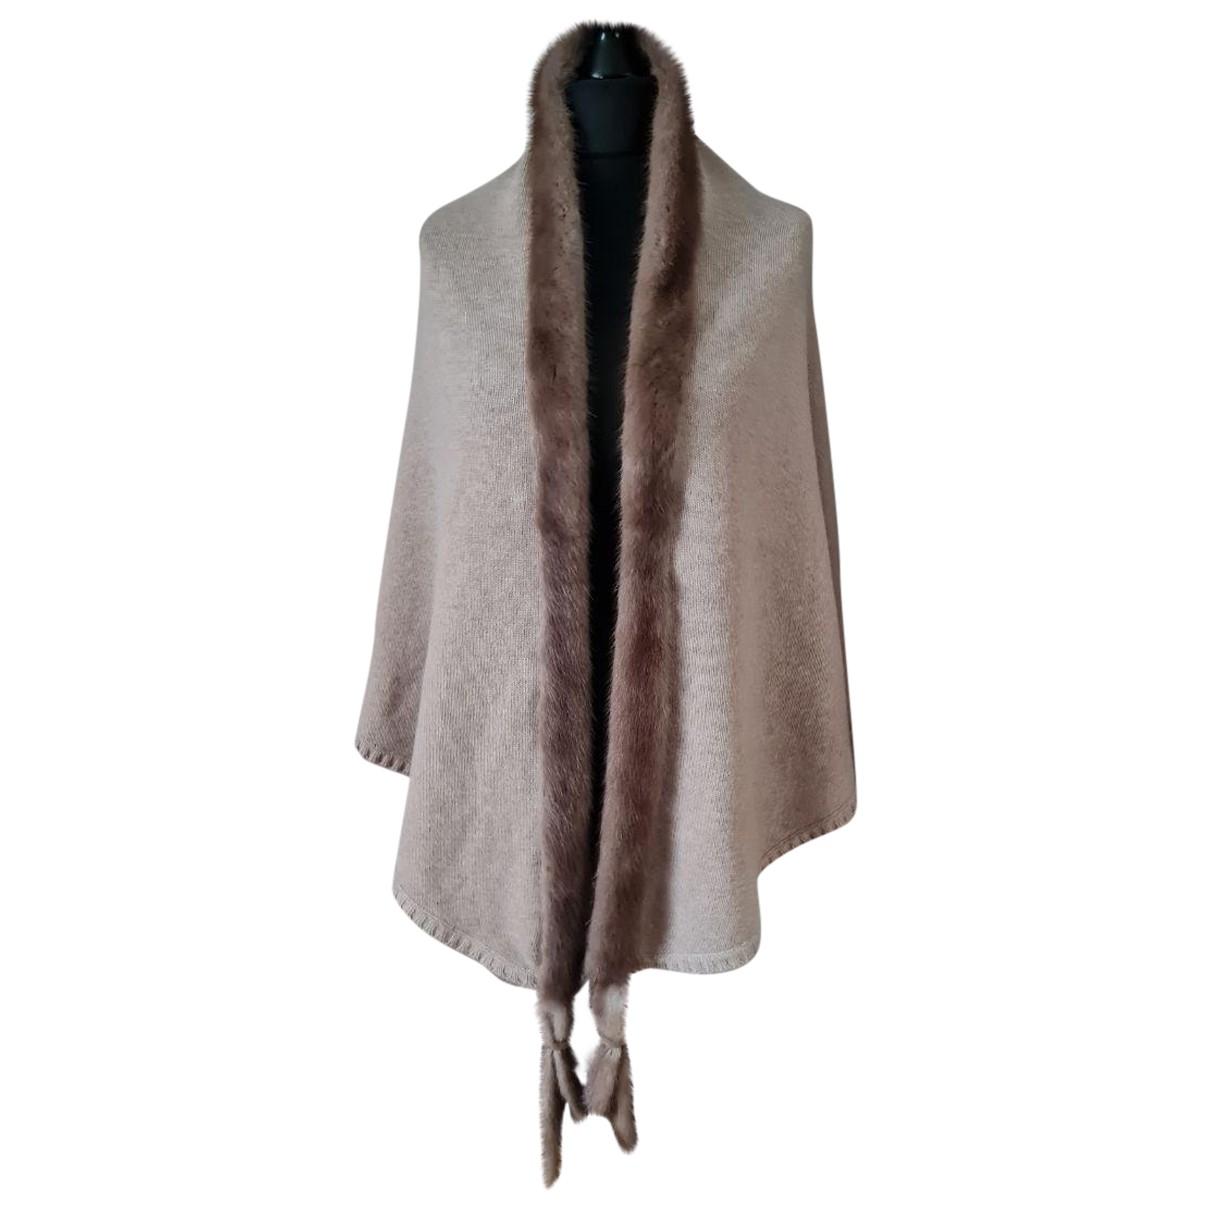 Max Mara - Foulard   pour femme en cachemire - beige